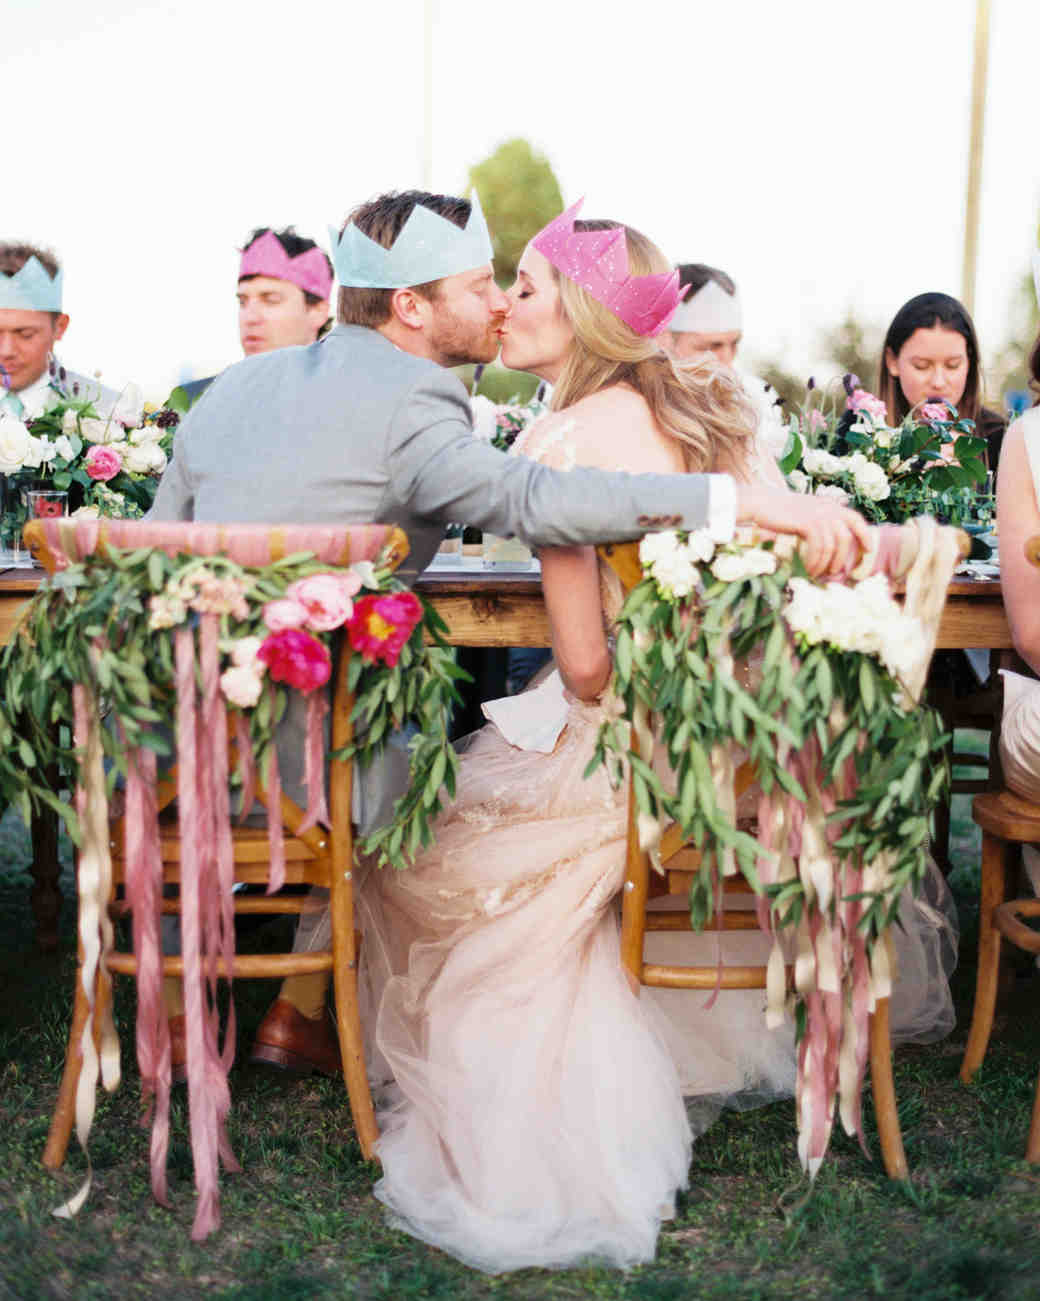 paige-chris-wedding-suite-135-s111485-0914.jpg